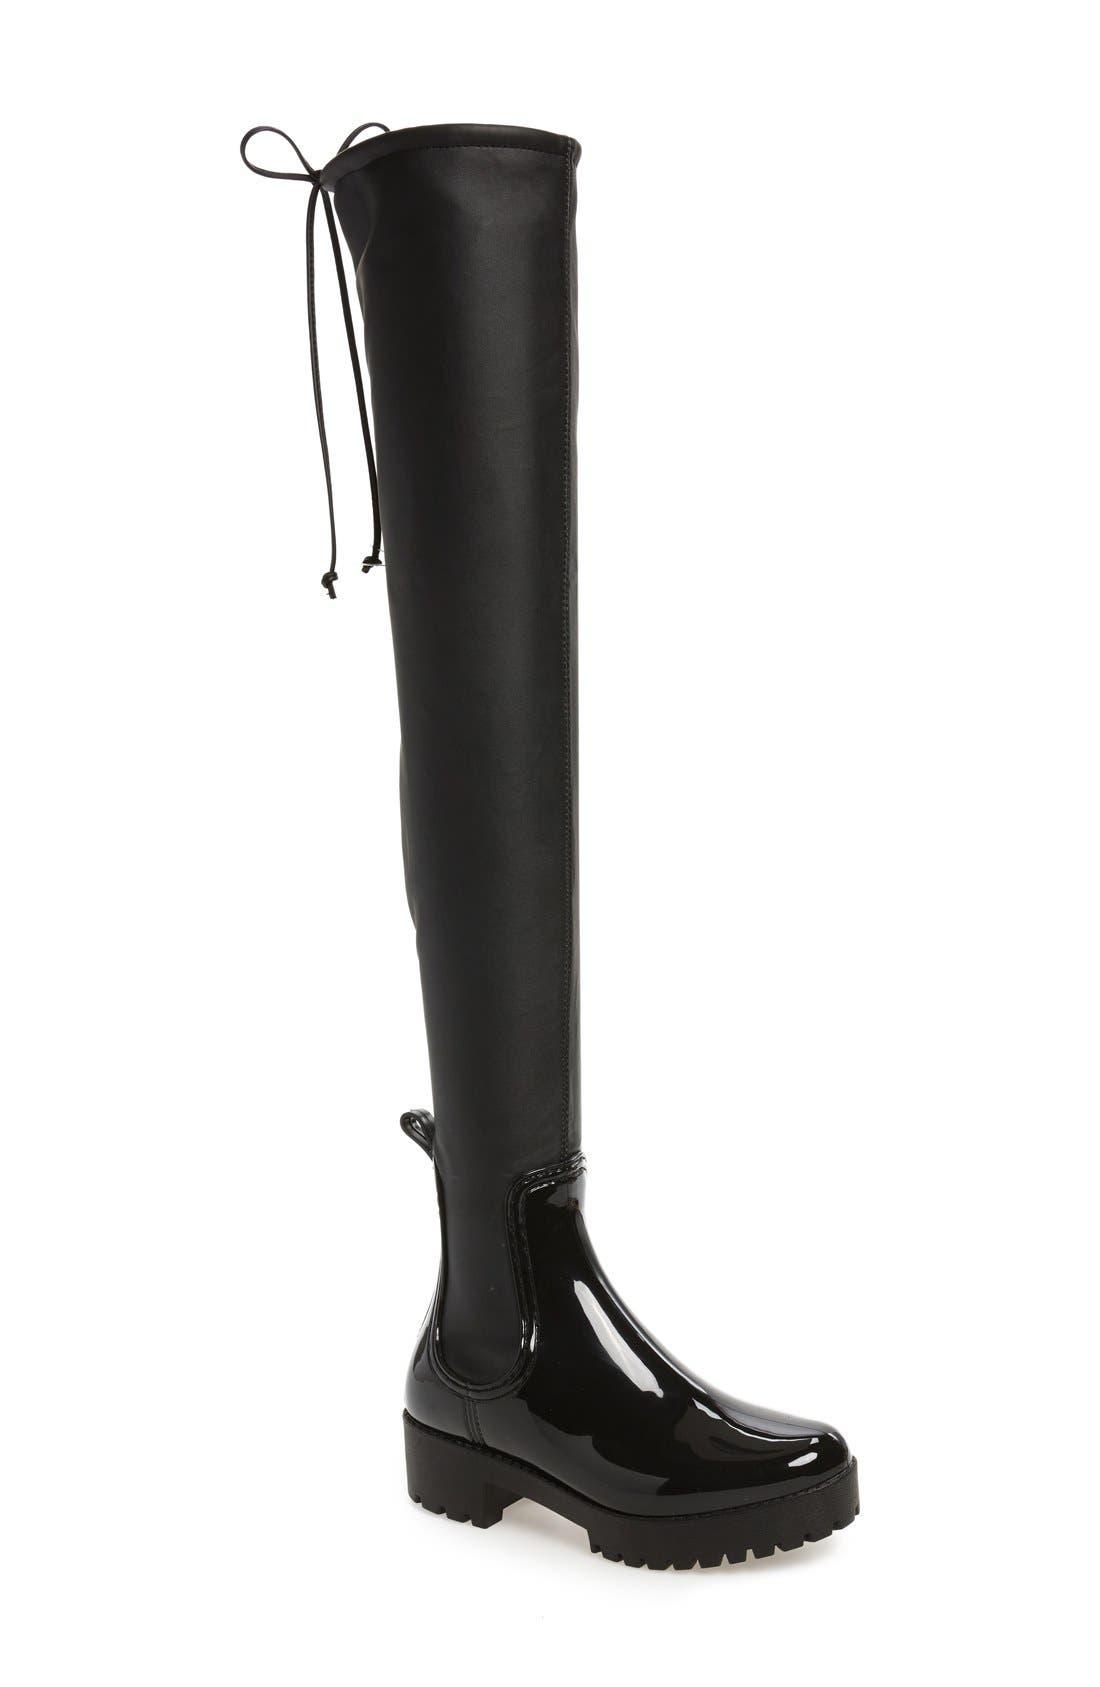 Cloudy Over the Knee Rain Boot,                         Main,                         color, Black Shiny Black